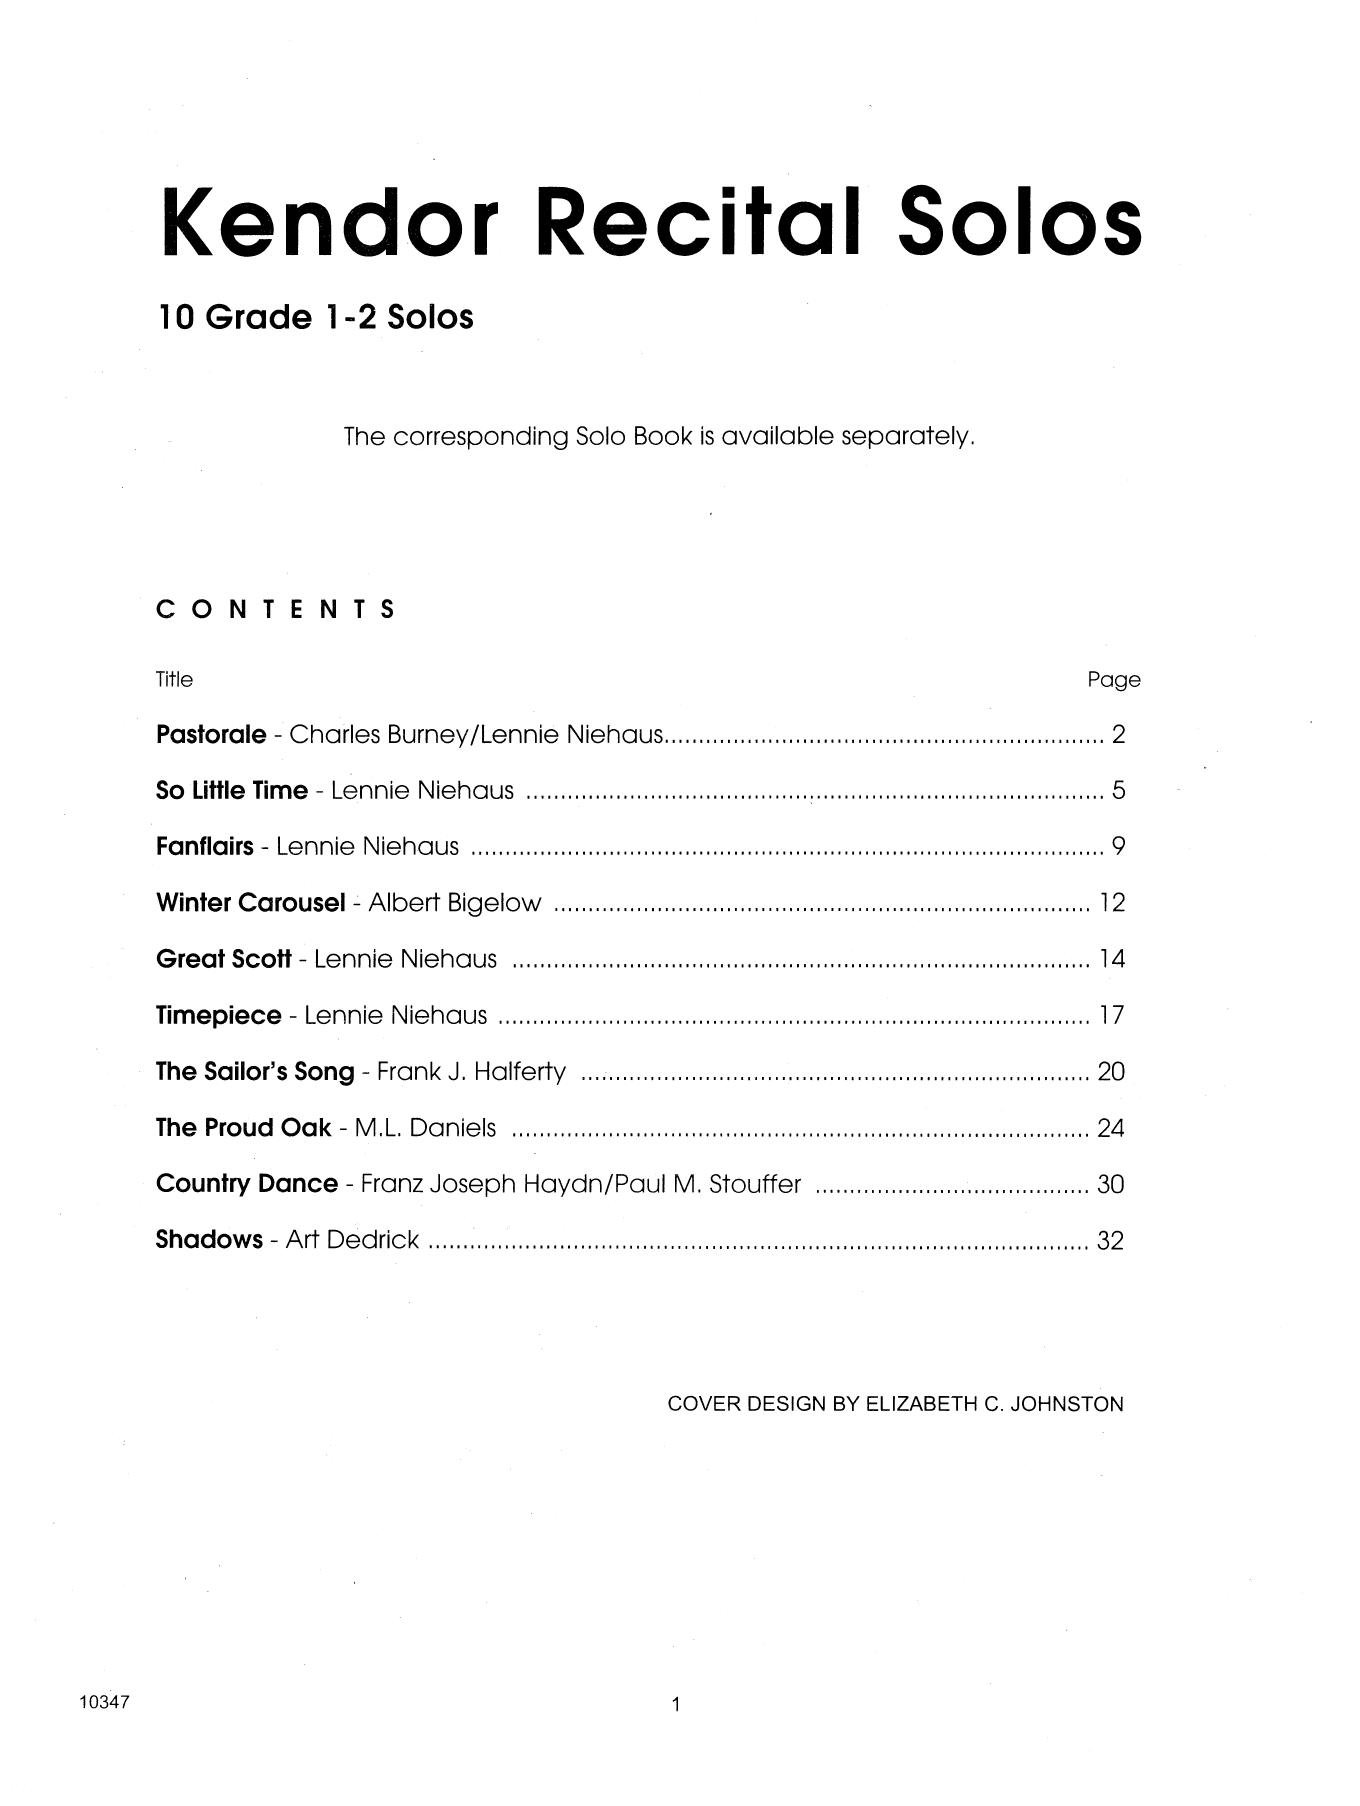 Kendor Recital Solos - Baritone - Piano Accompaniment Sheet Music